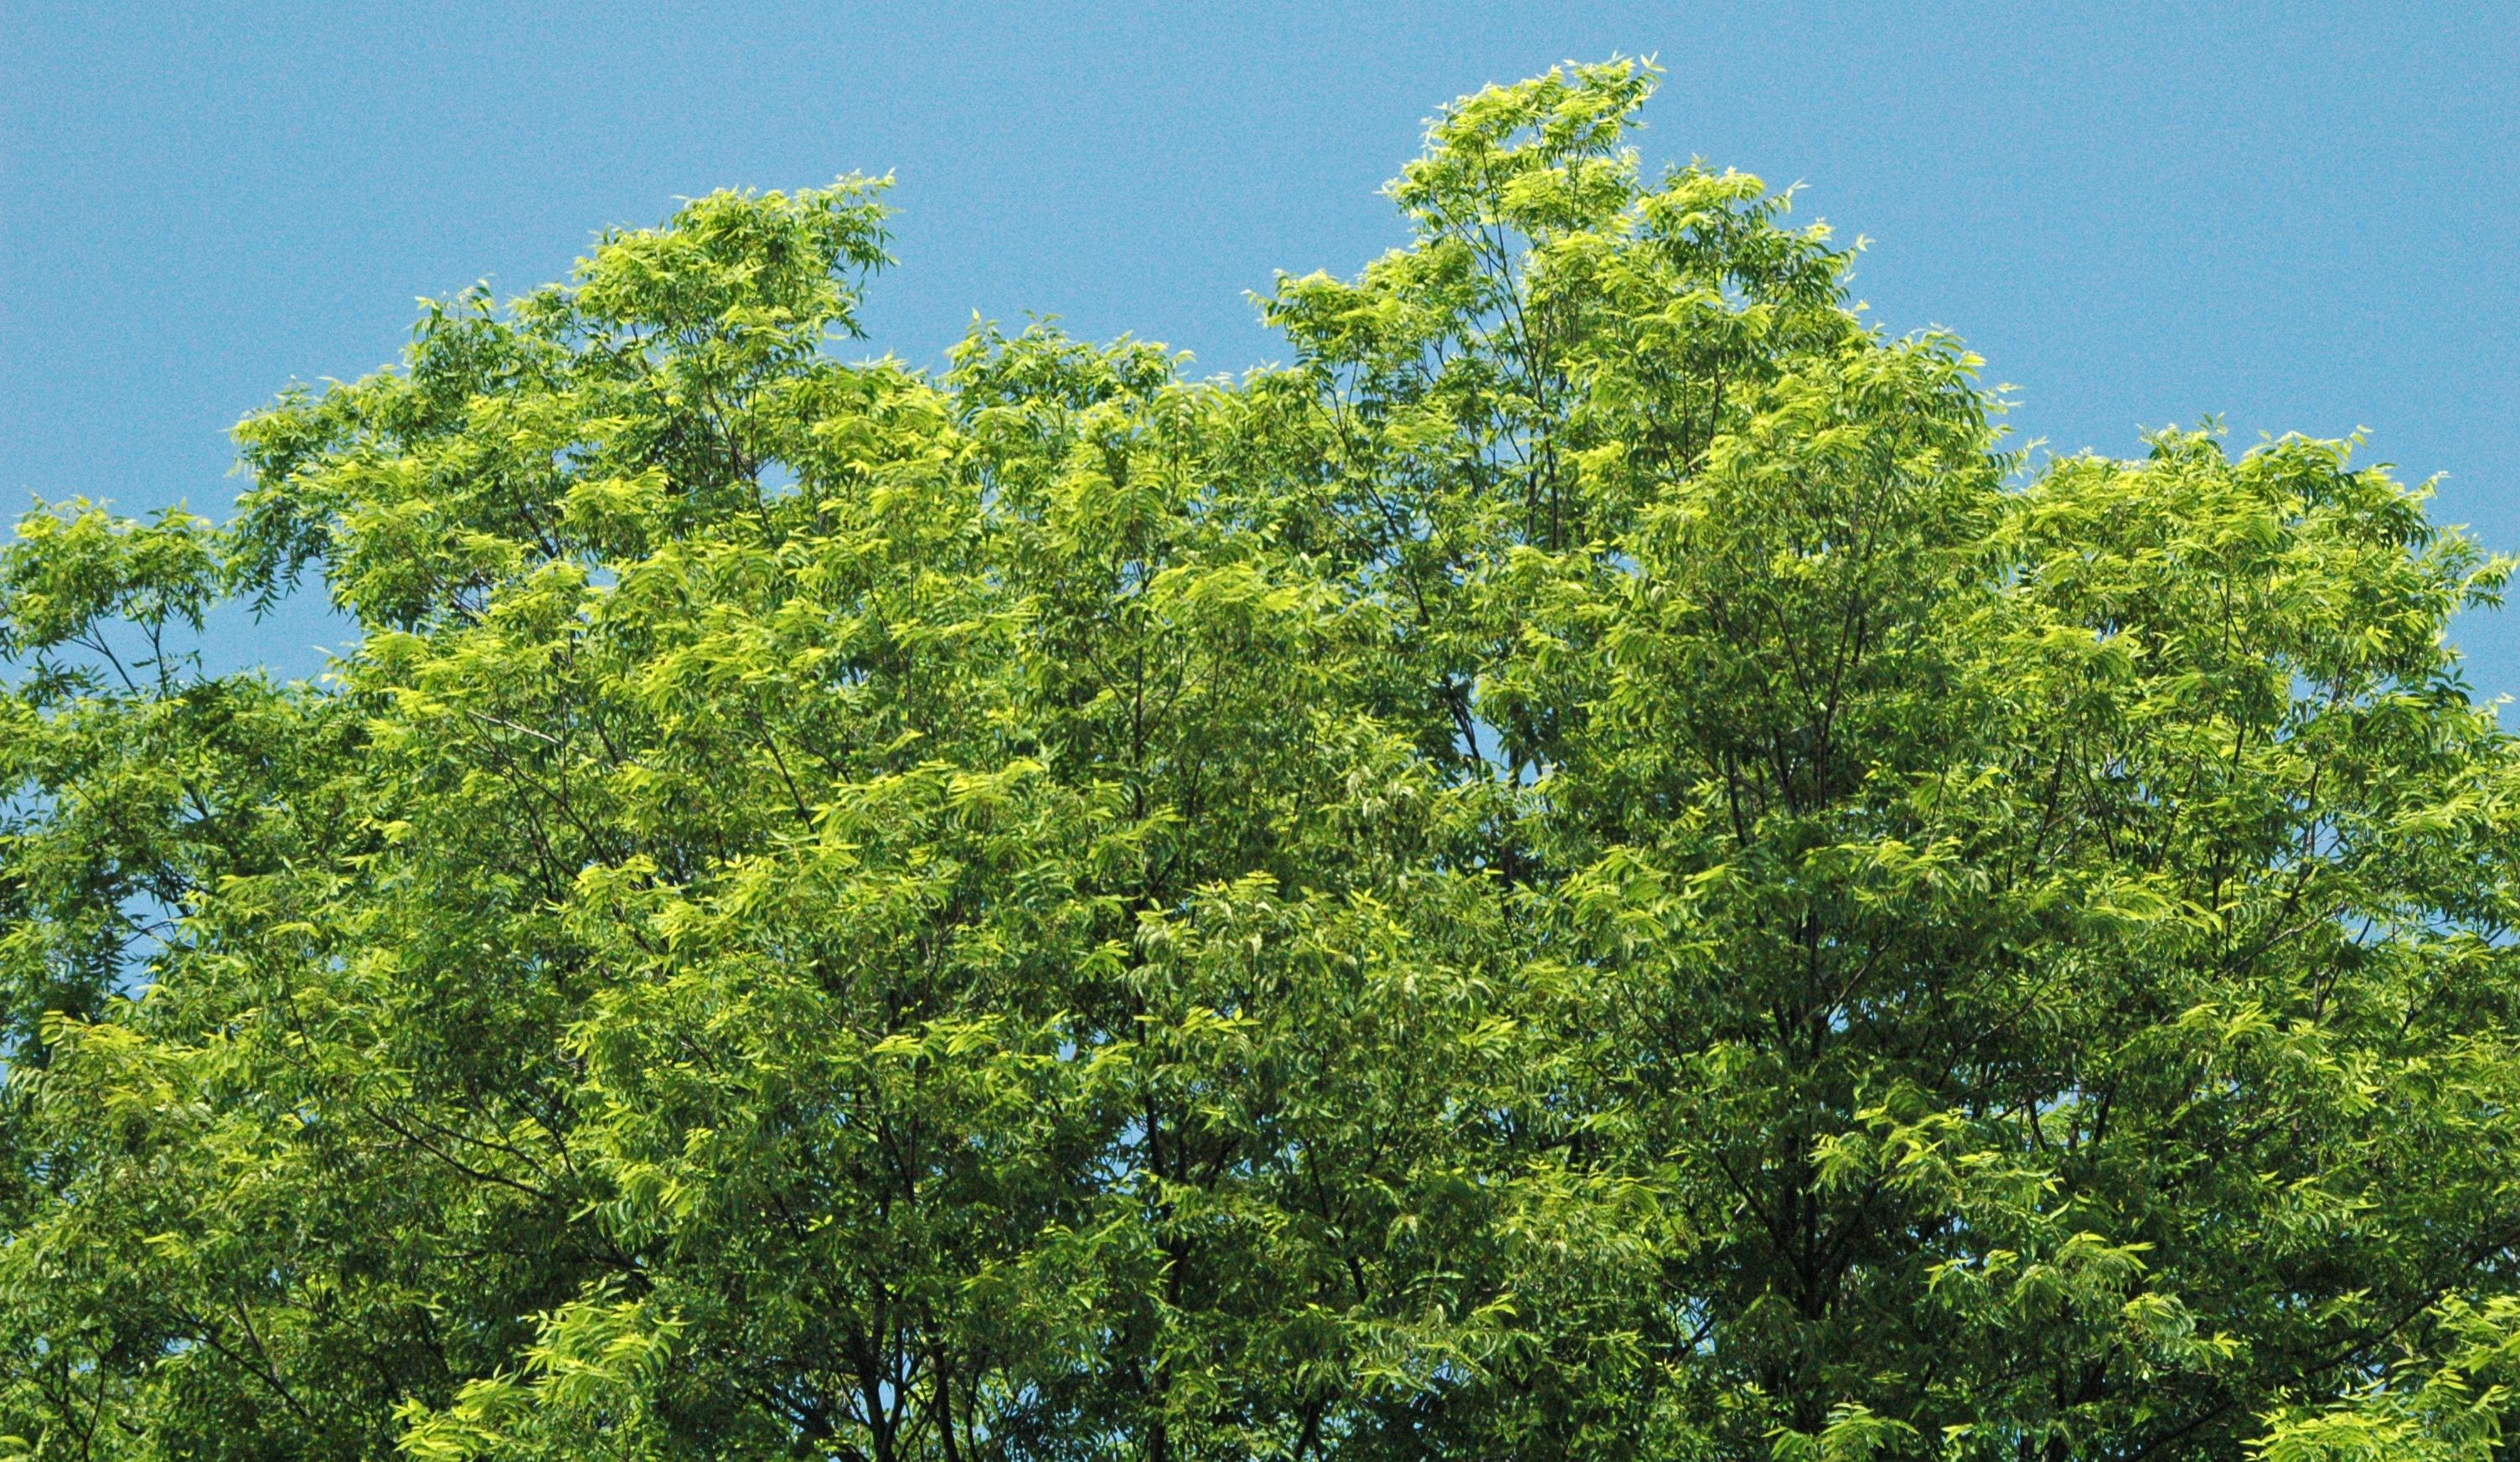 Carya illinoinensis (pecan tree) 2